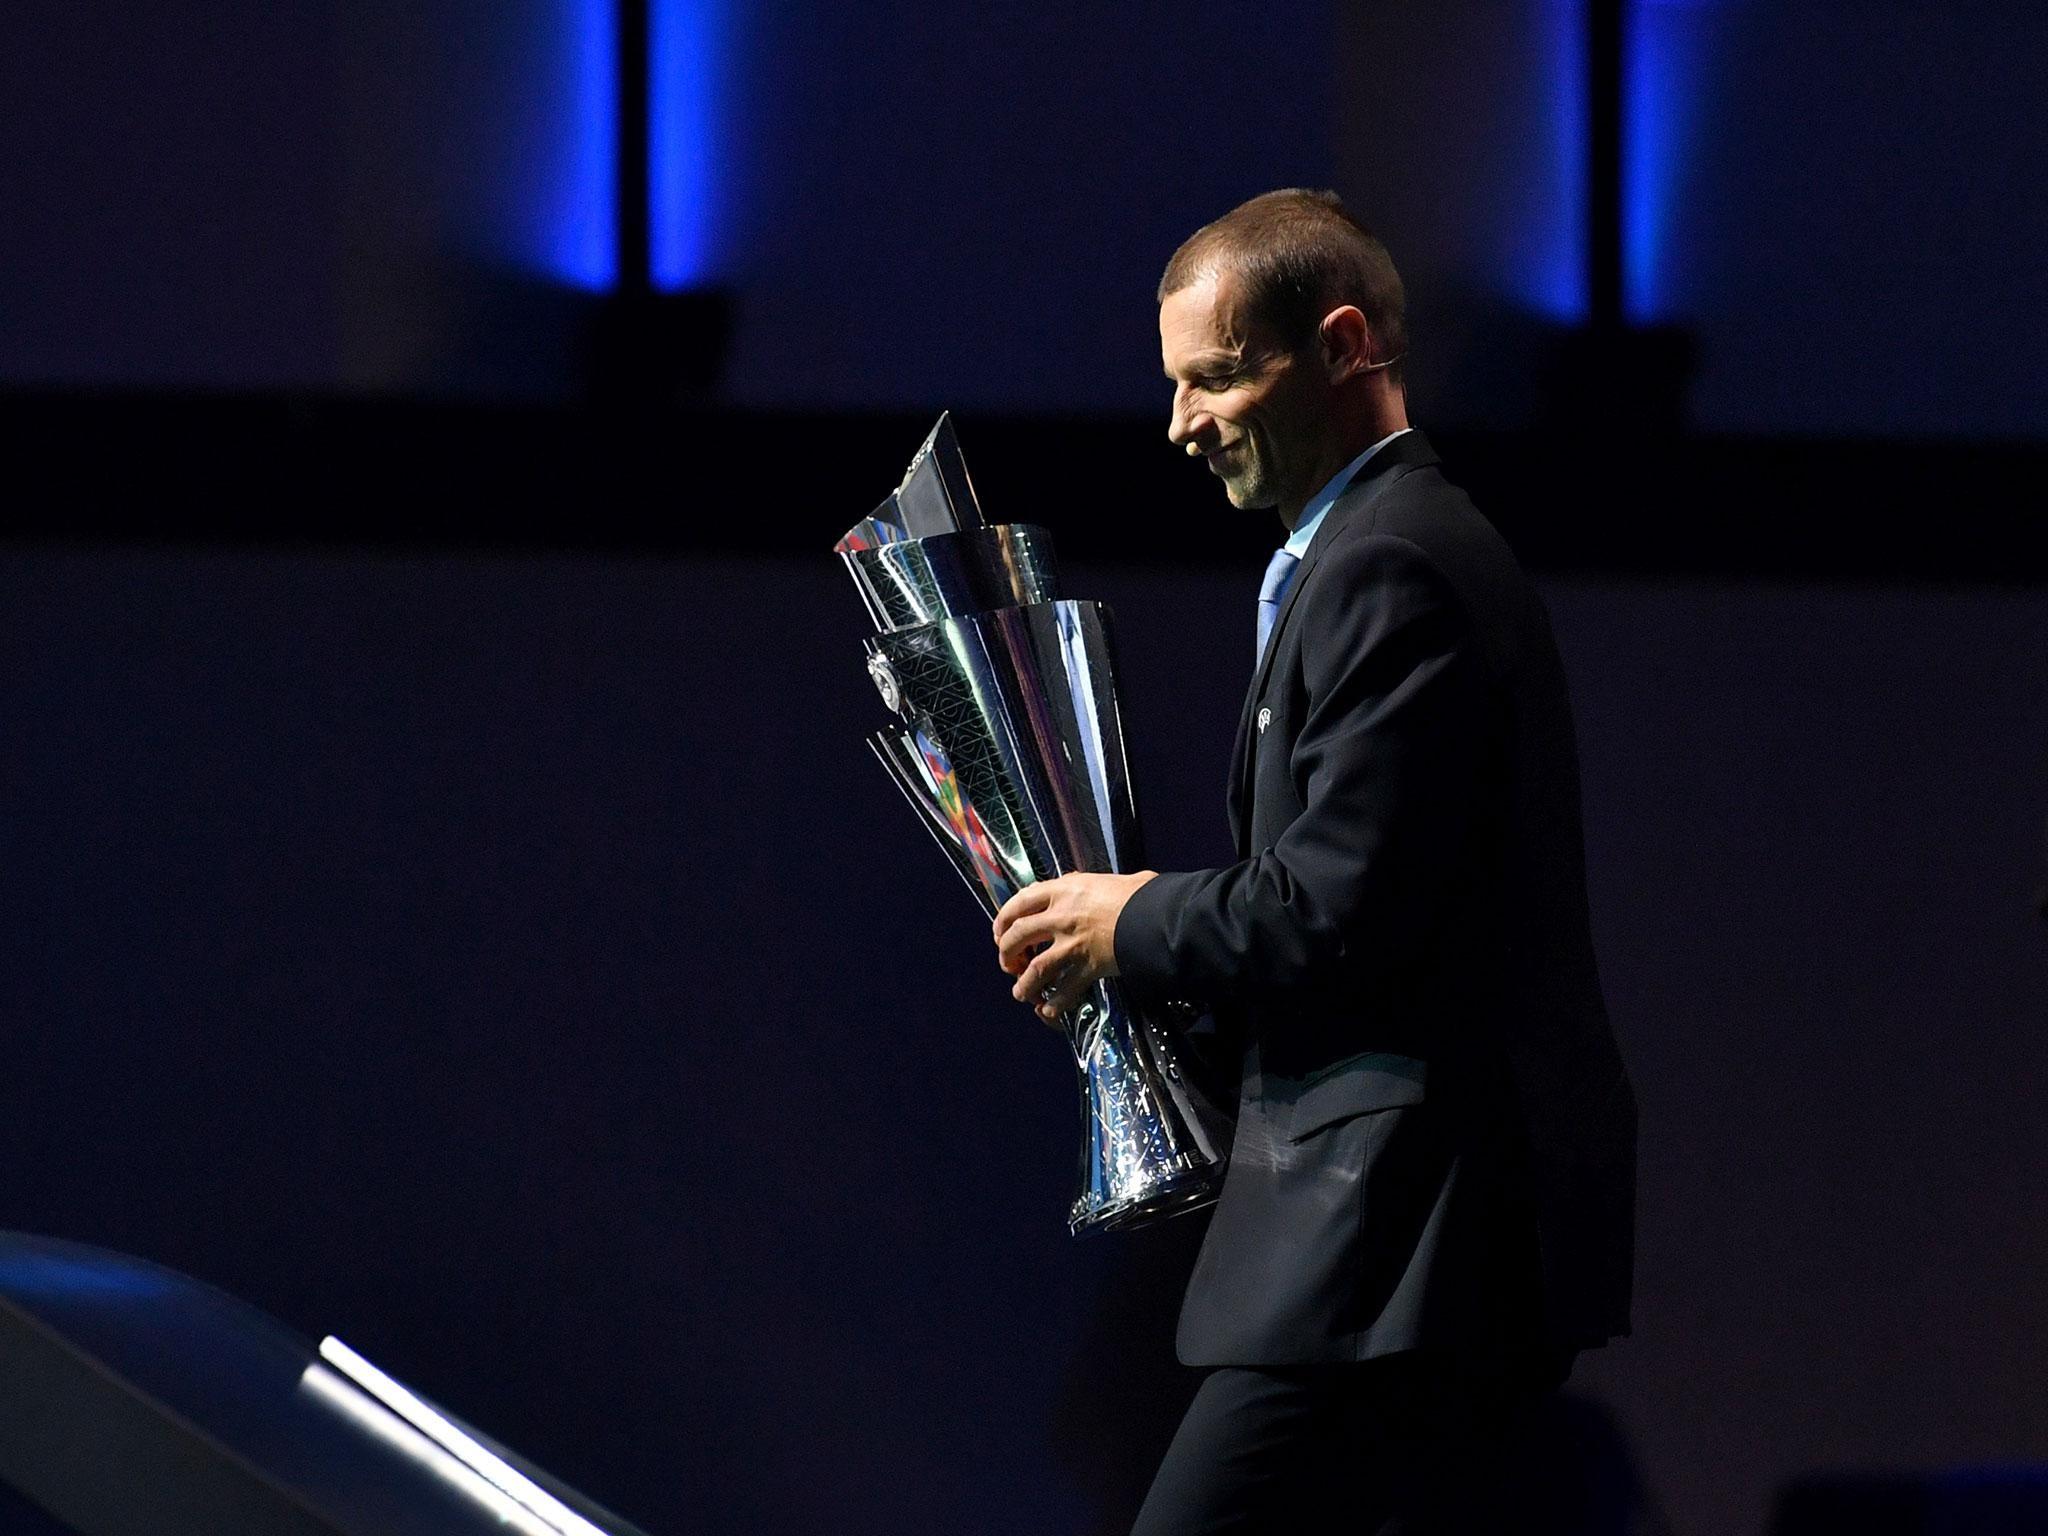 England drawn alongside Croatia and Spain for inaugural Uefa Nations League